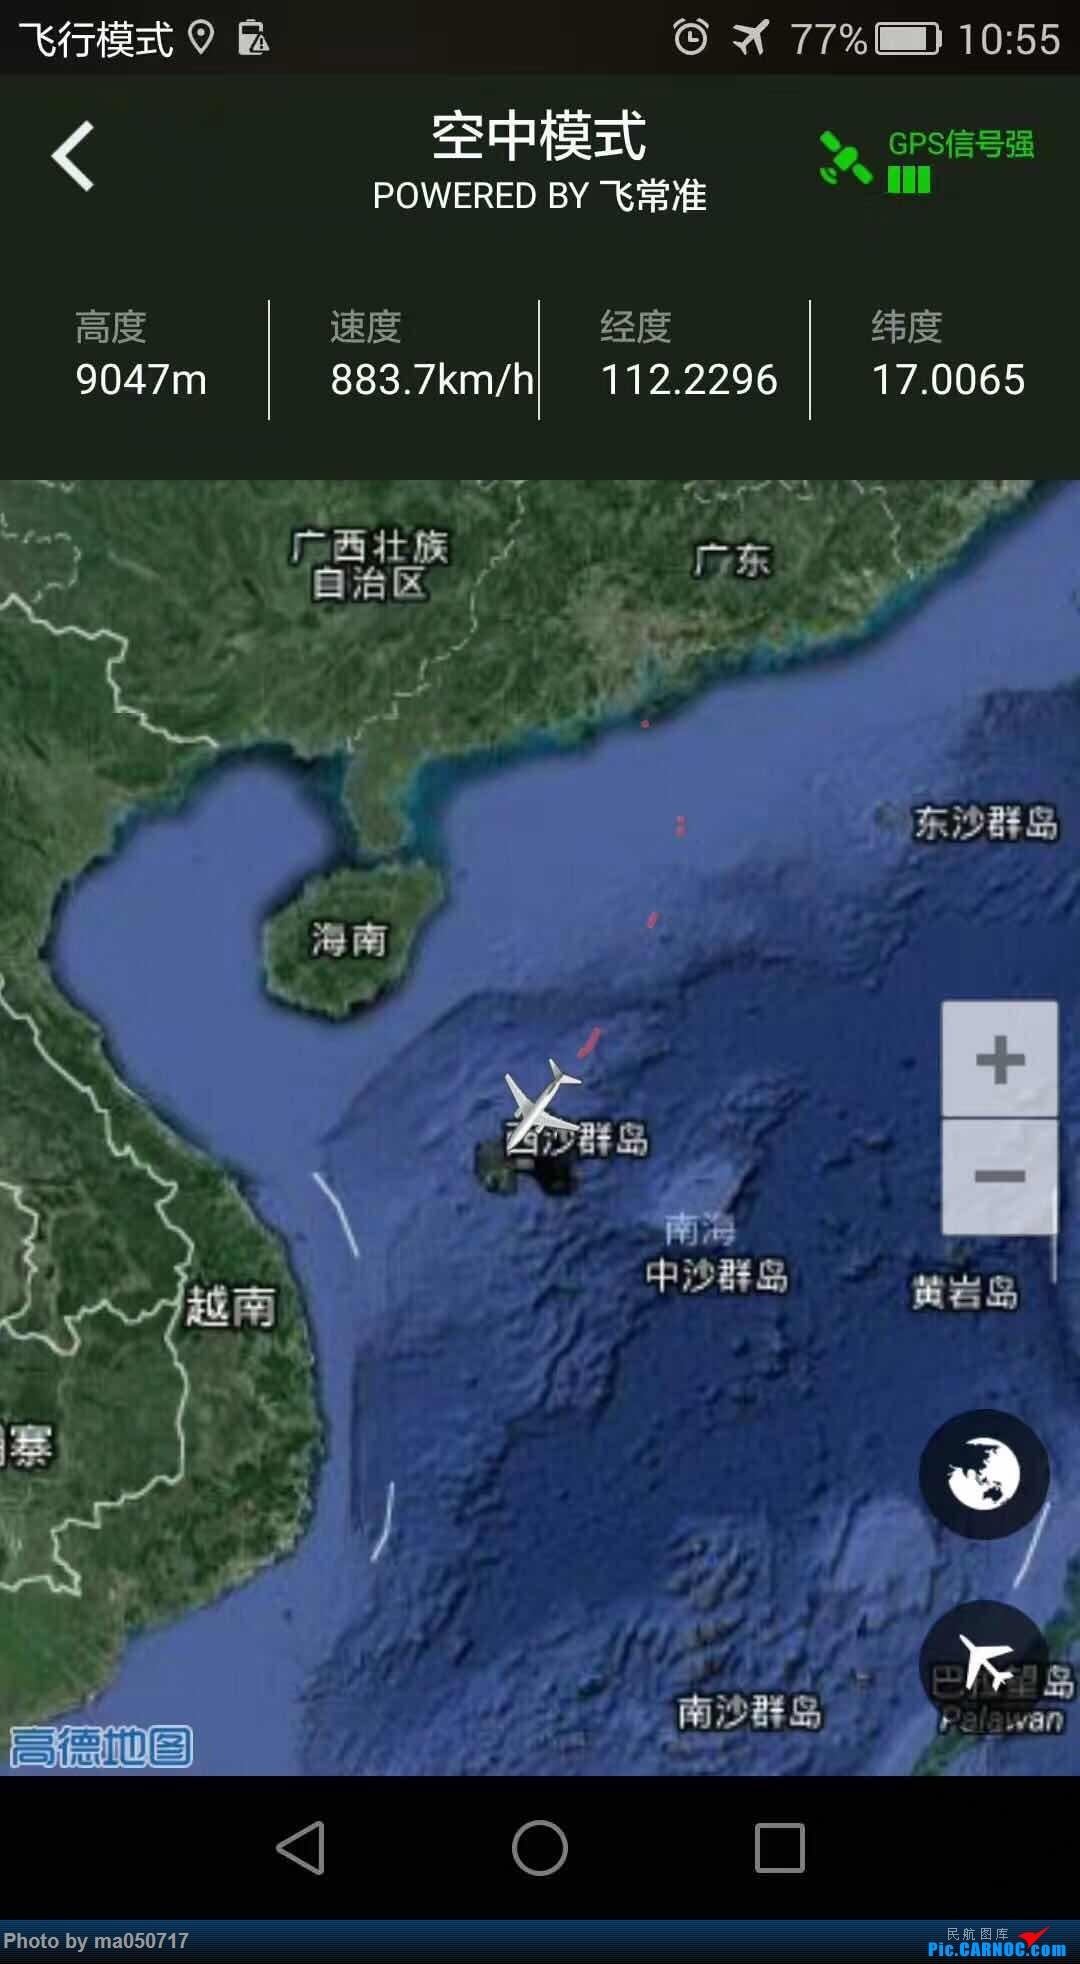 Re:[原创]【CurryMa游记3】中国南方航空CZ3069 广州-胡志明市 B737-800